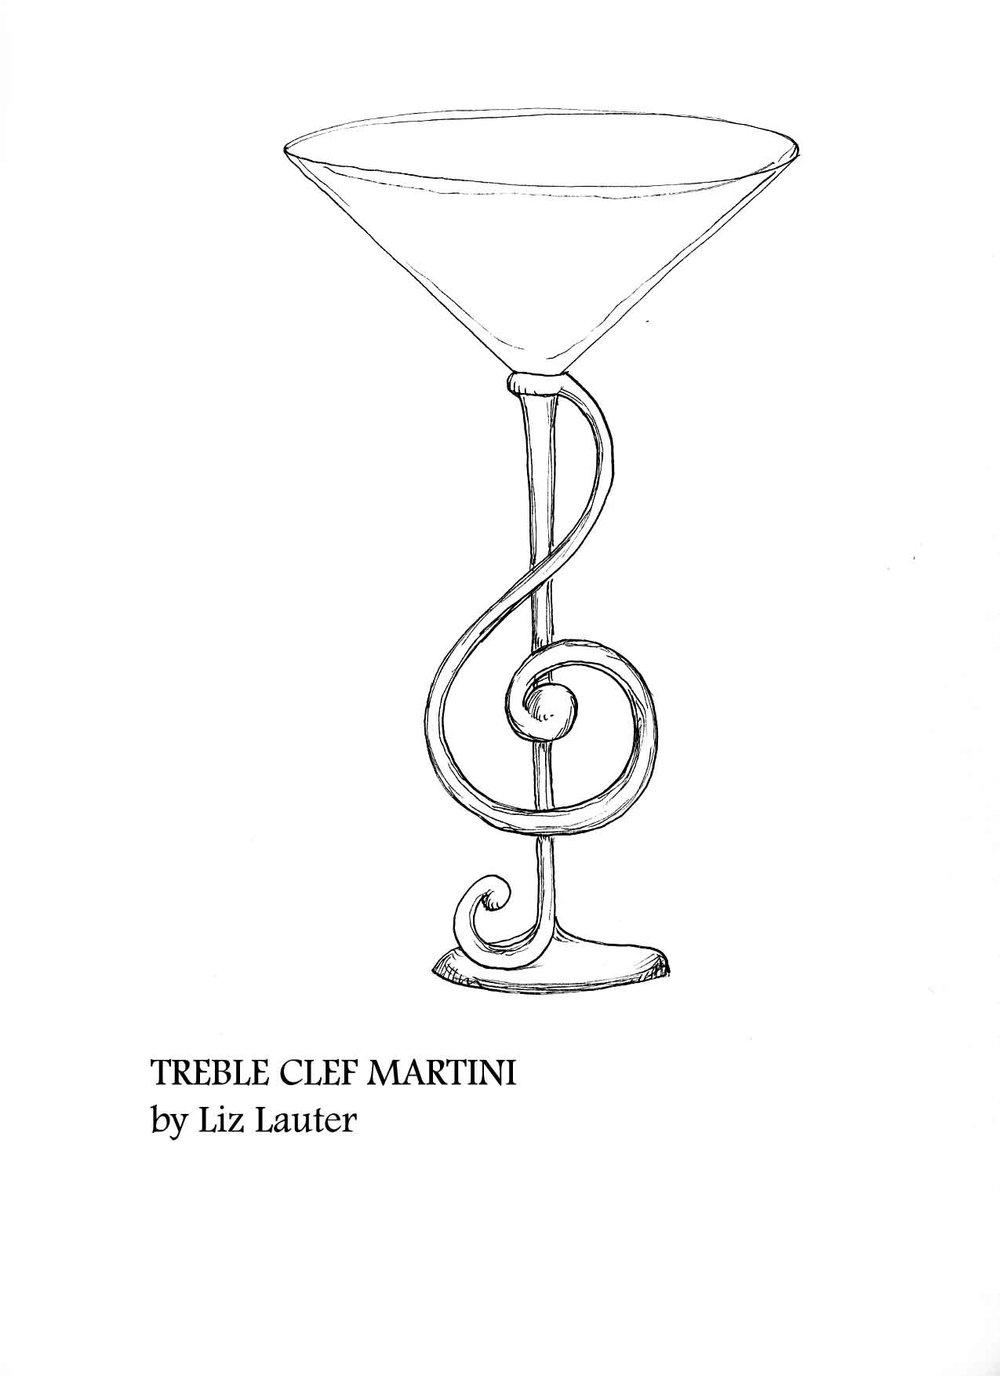 treble clef martini.jpg